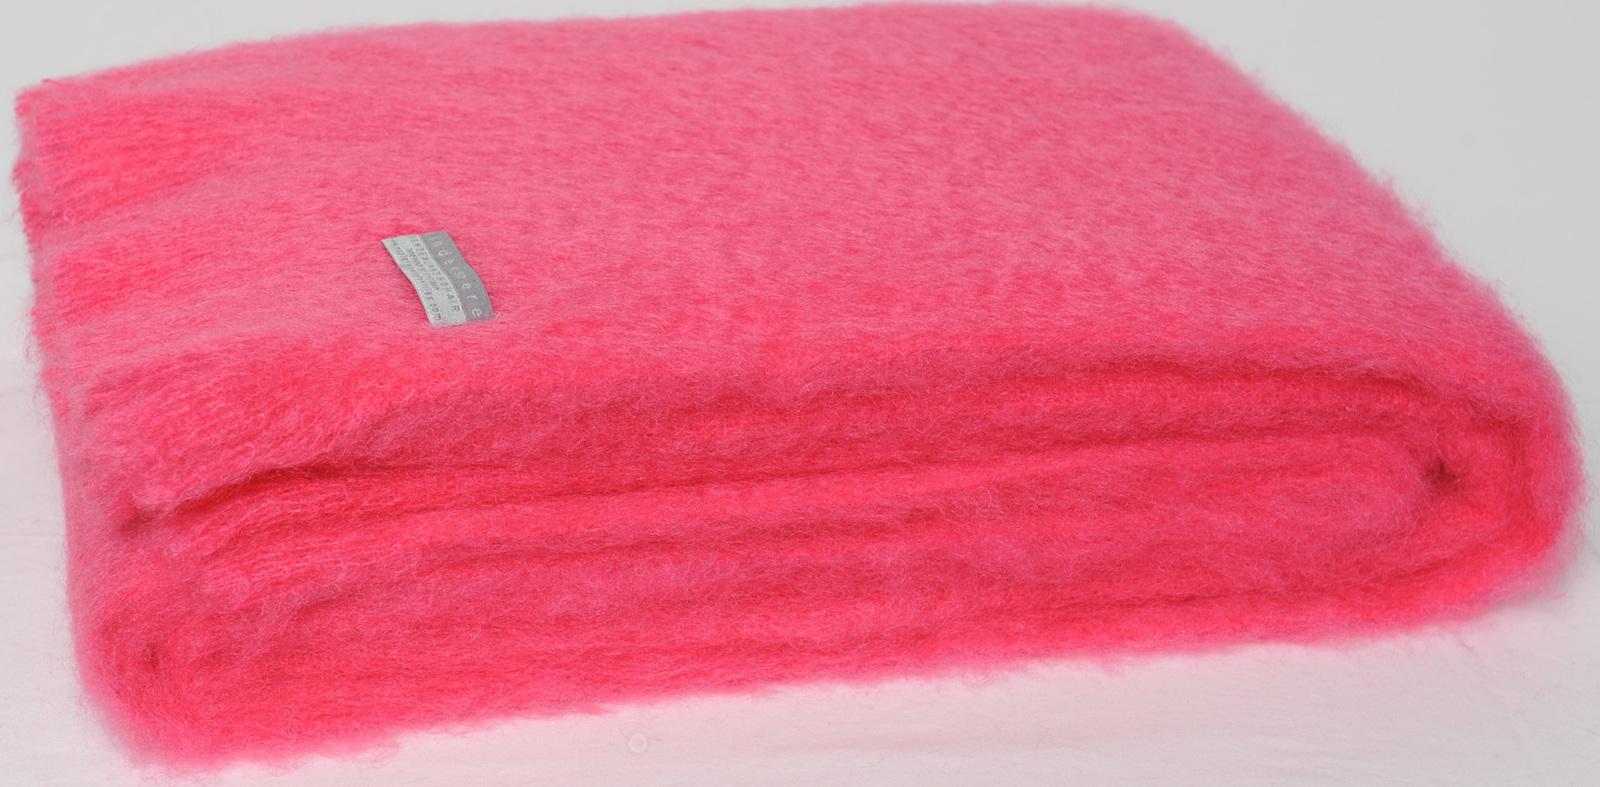 Finest Mohair Throw Blanket - Hot Pink - The Mohair Store QP05